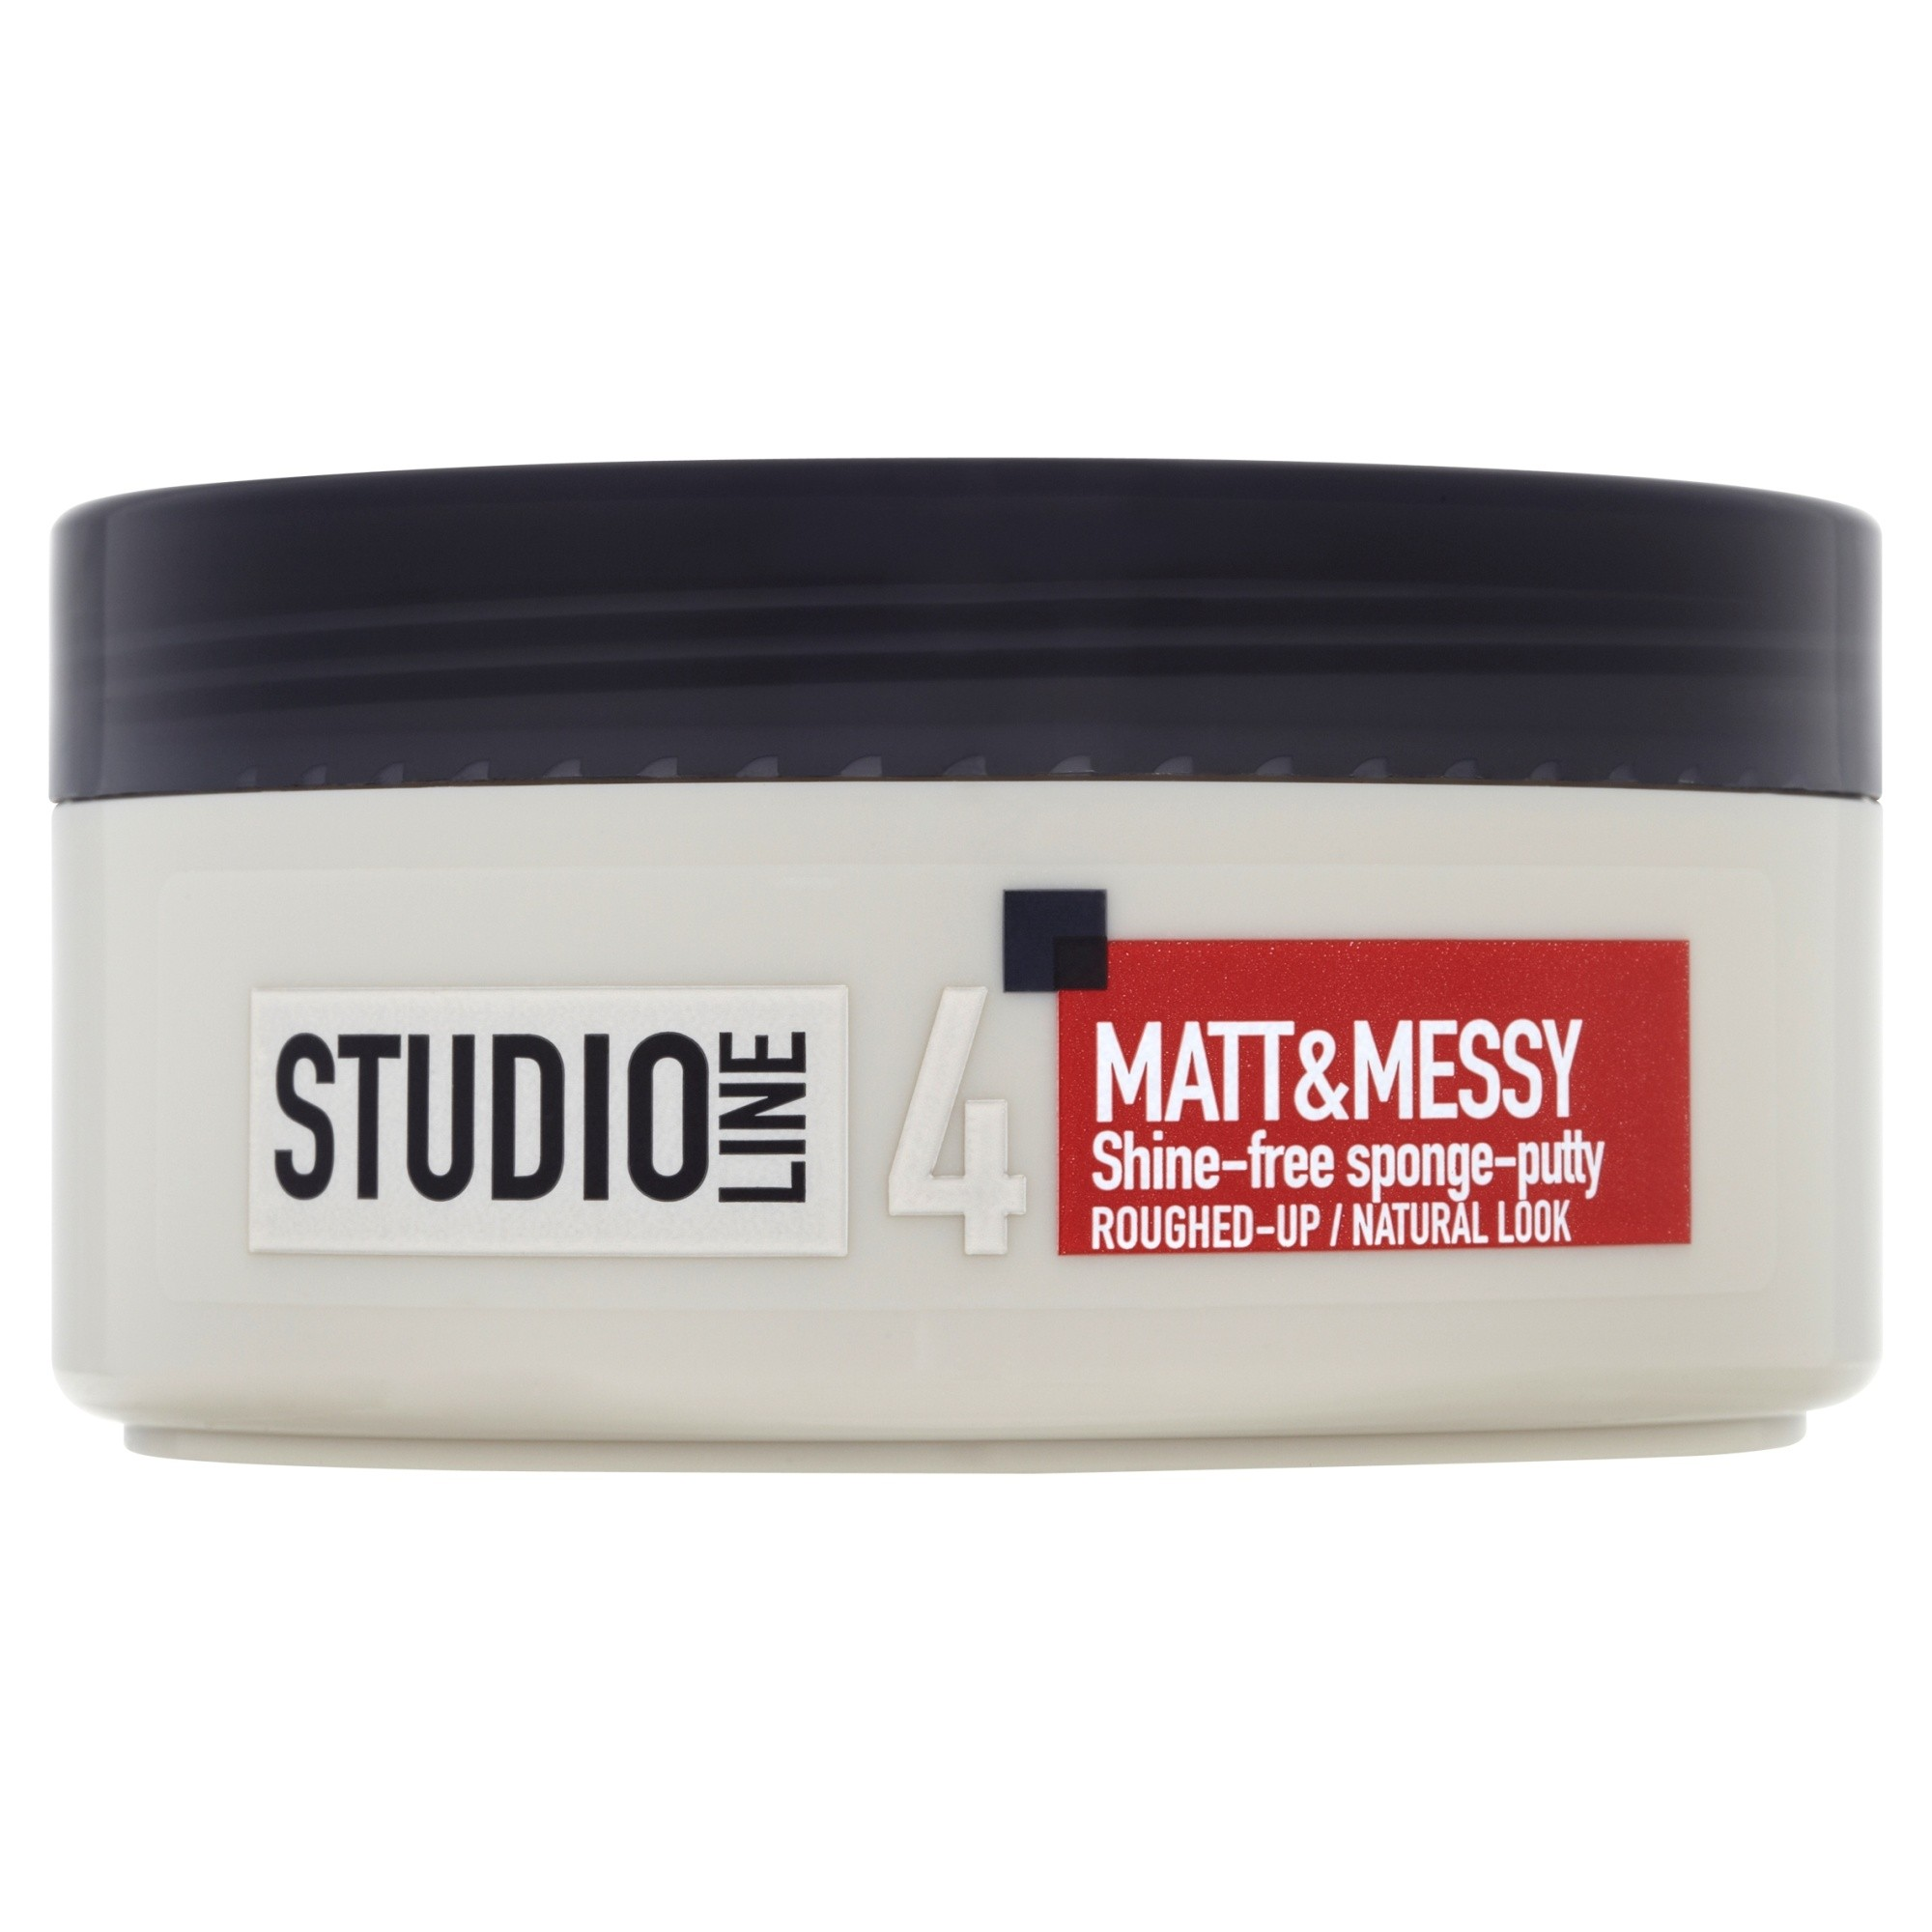 L'Oreal Paris Studio Line Matt & Messy Sponge Putty